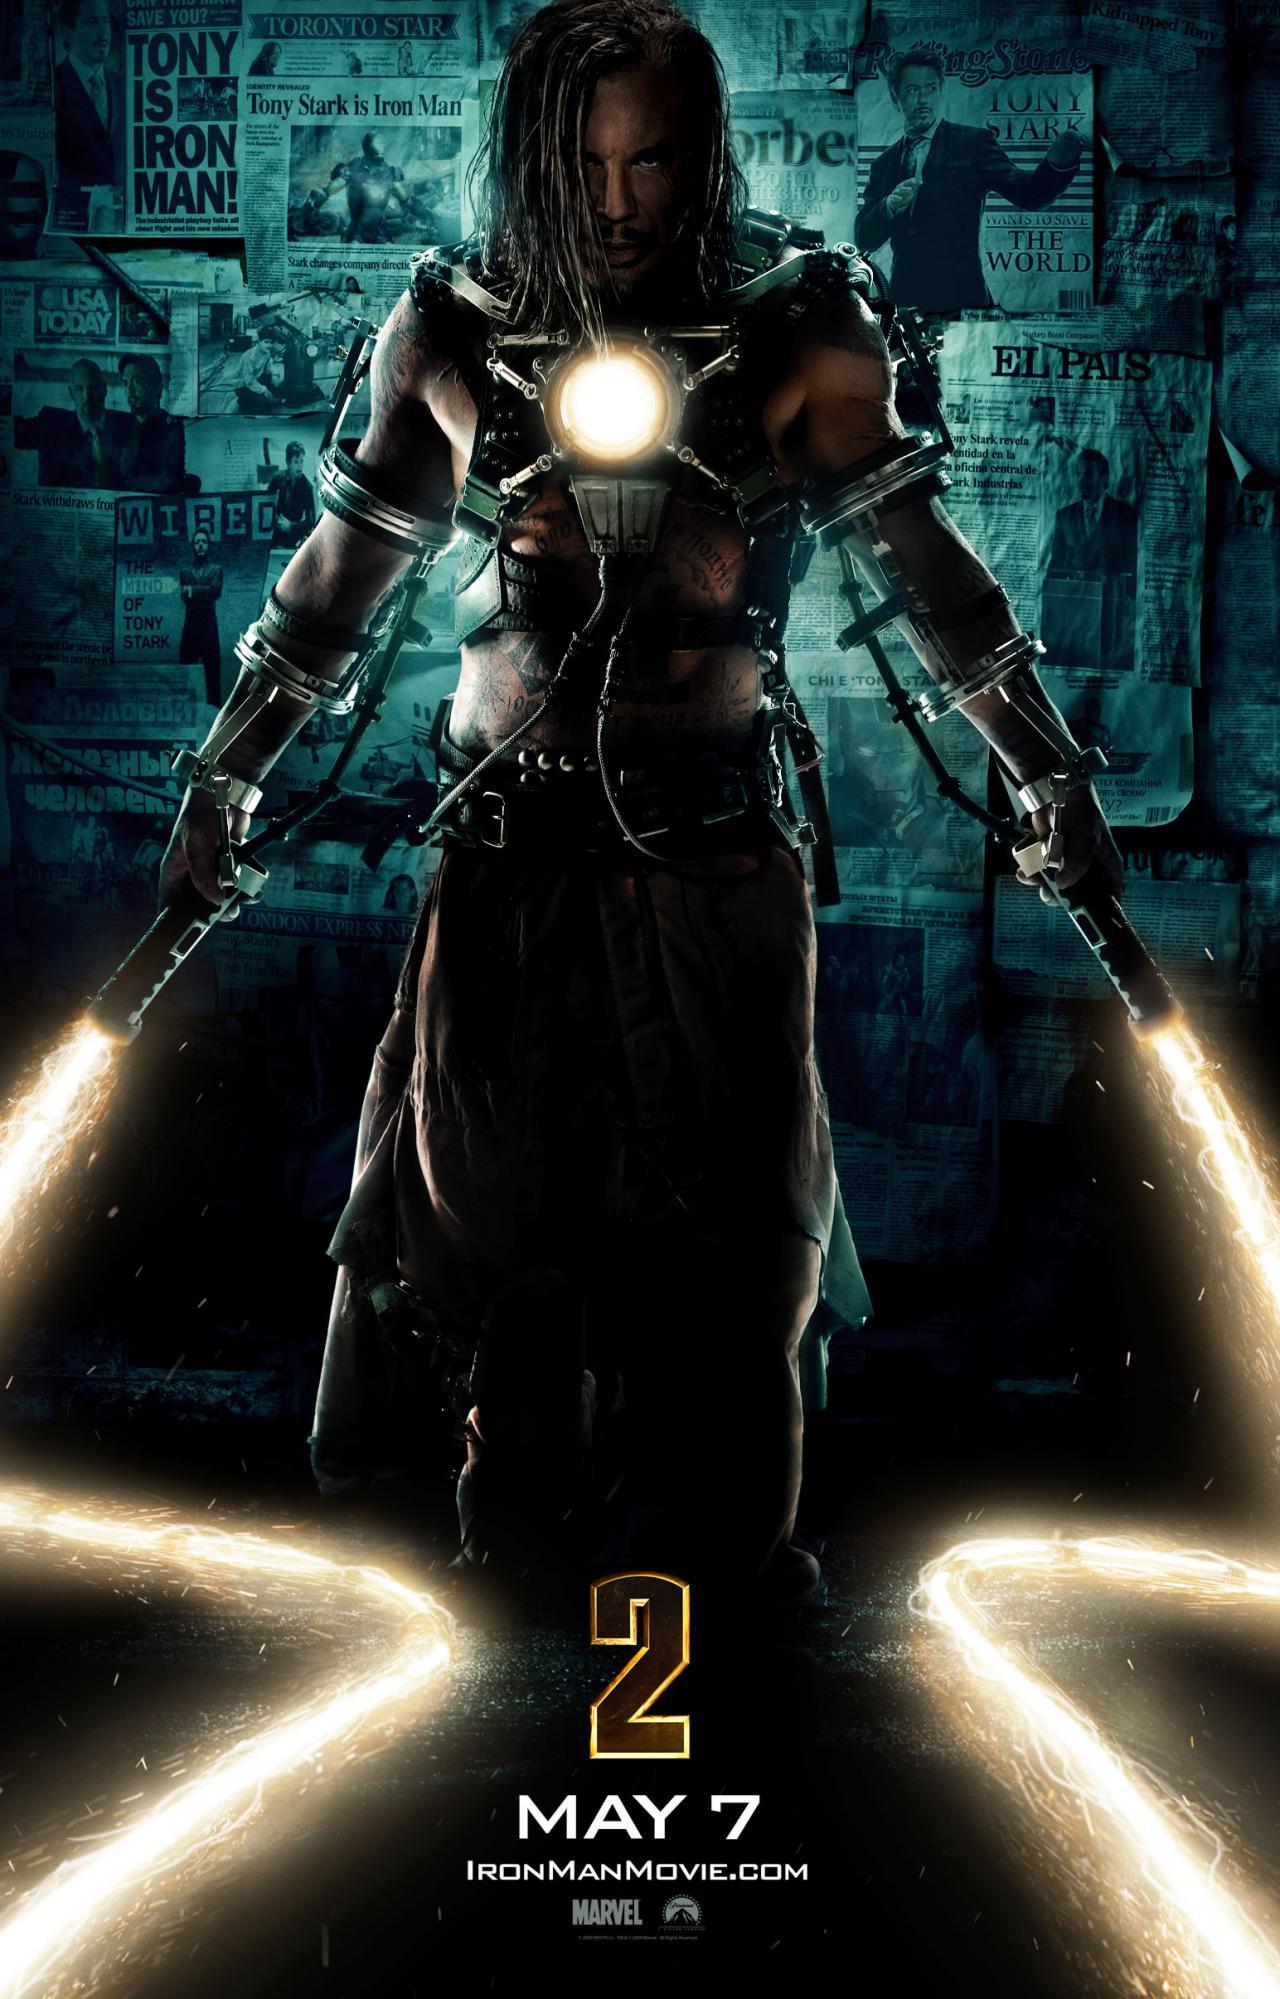 Wallpaper Affiche Iron Man 2 Ivan Vanko Iron Man